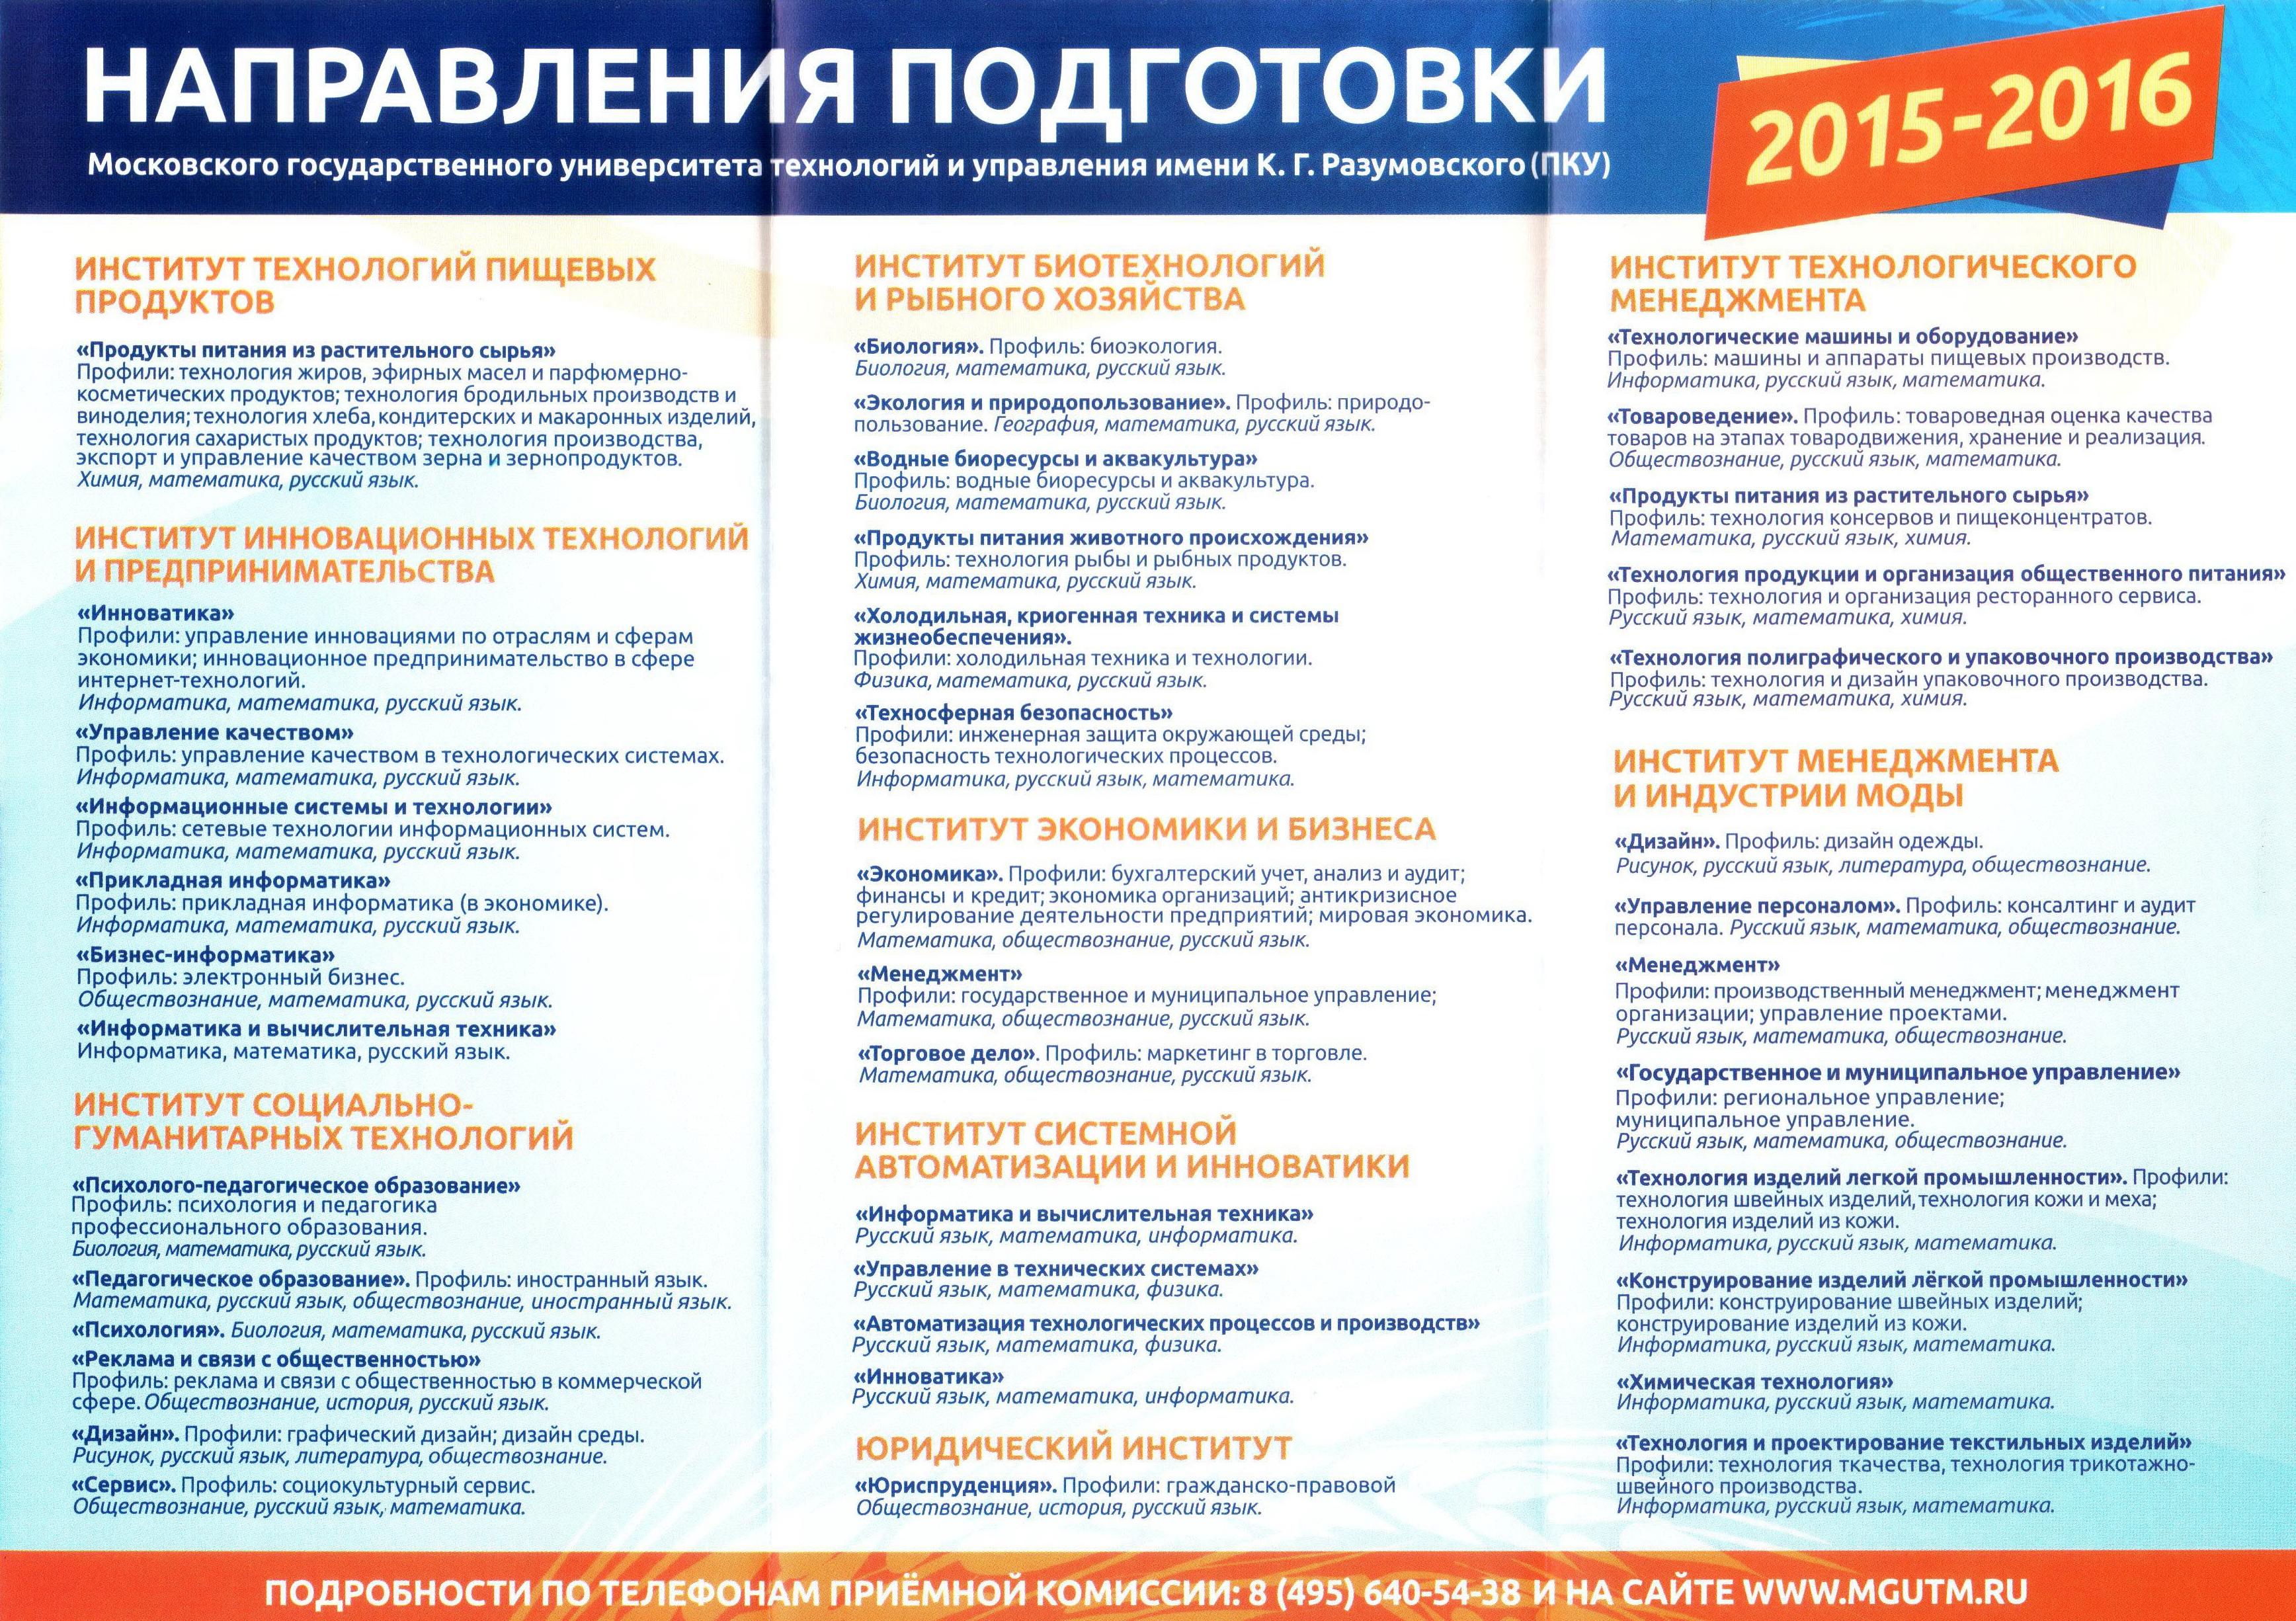 https://img-fotki.yandex.ru/get/4509/17259814.15/0_9301a_949a8164_orig